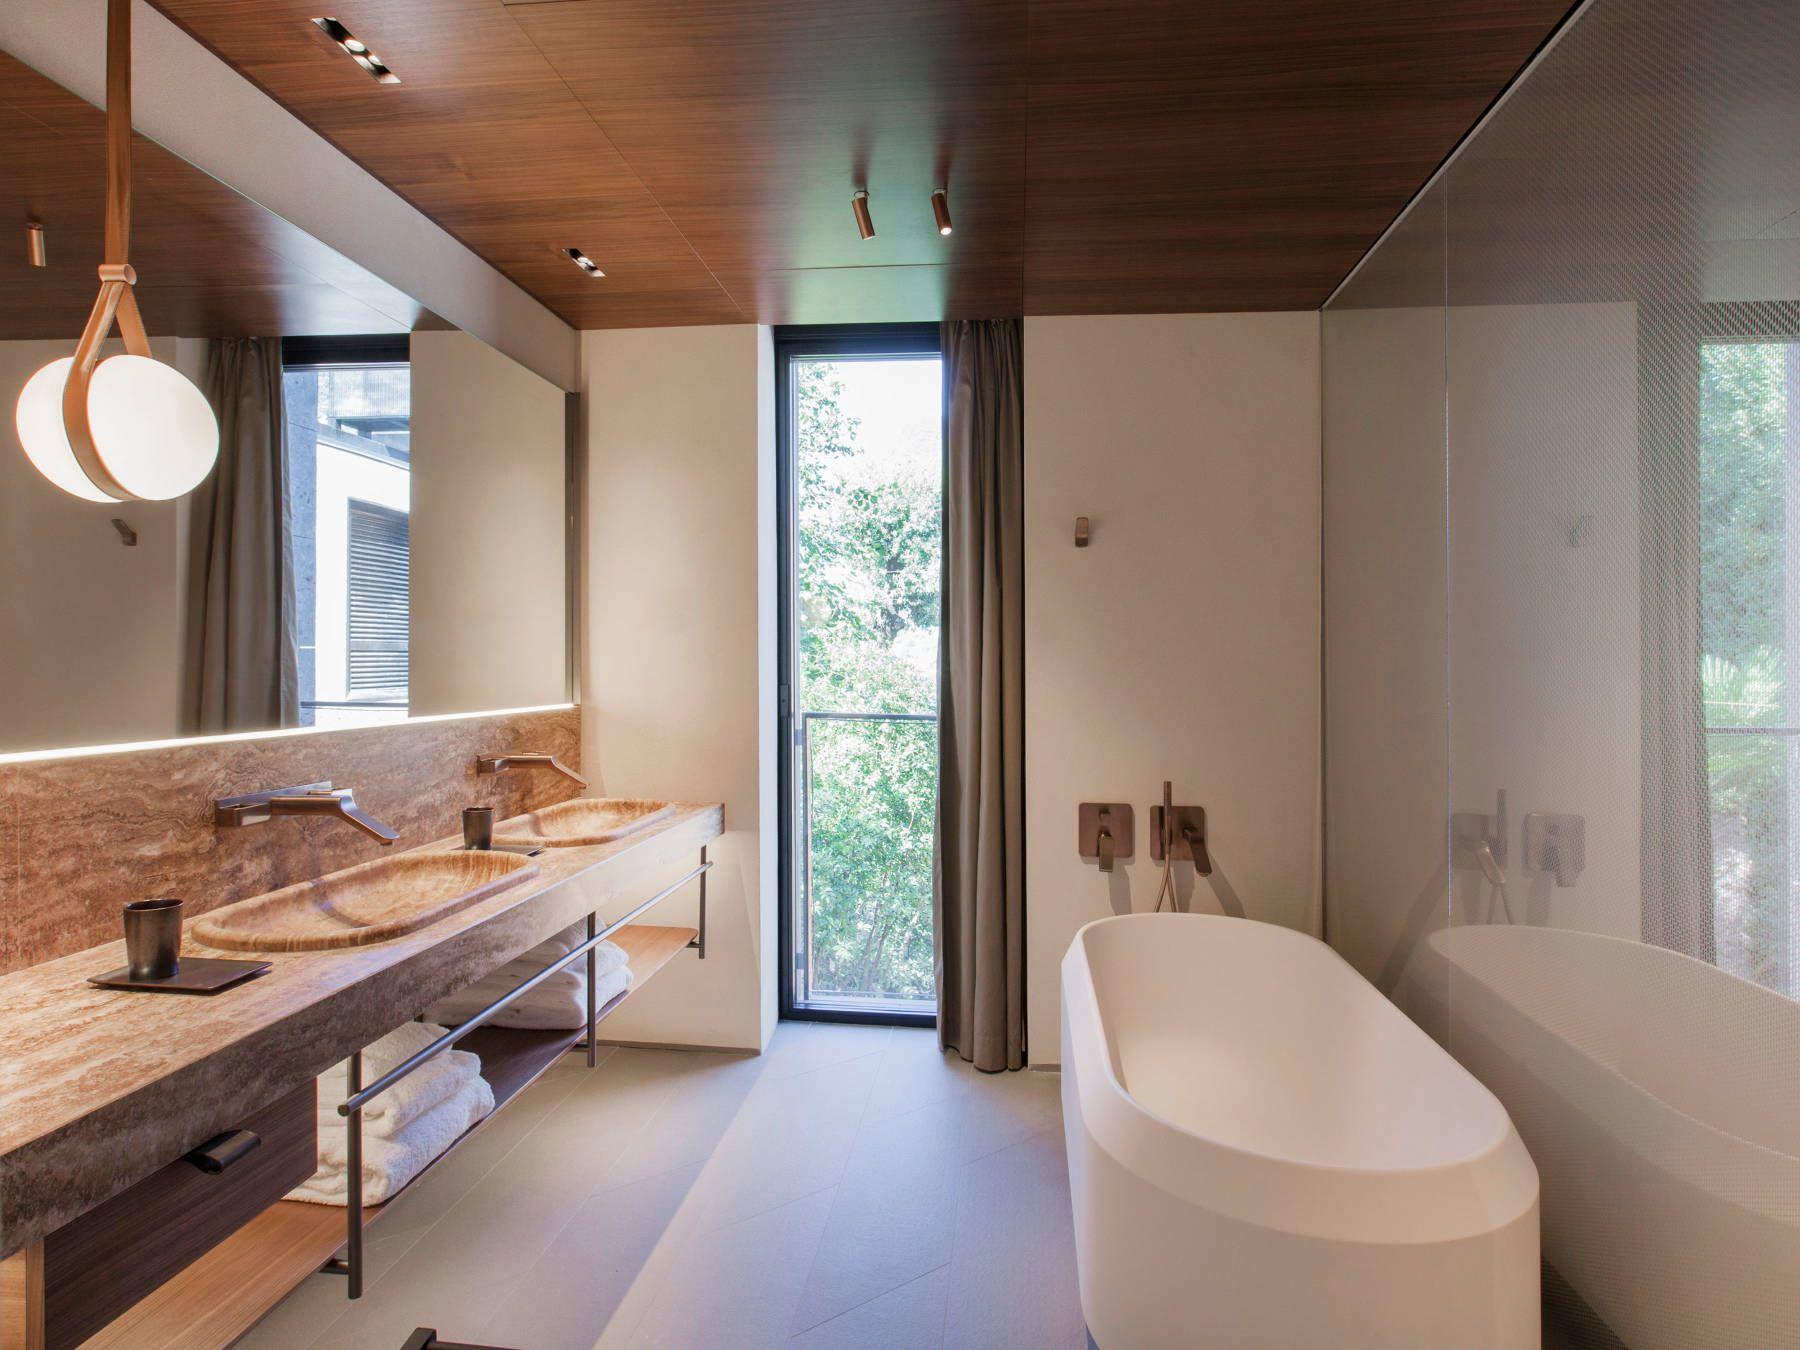 11-stary luxury in the hotel bathroom.  Luxusbad, Design hotel